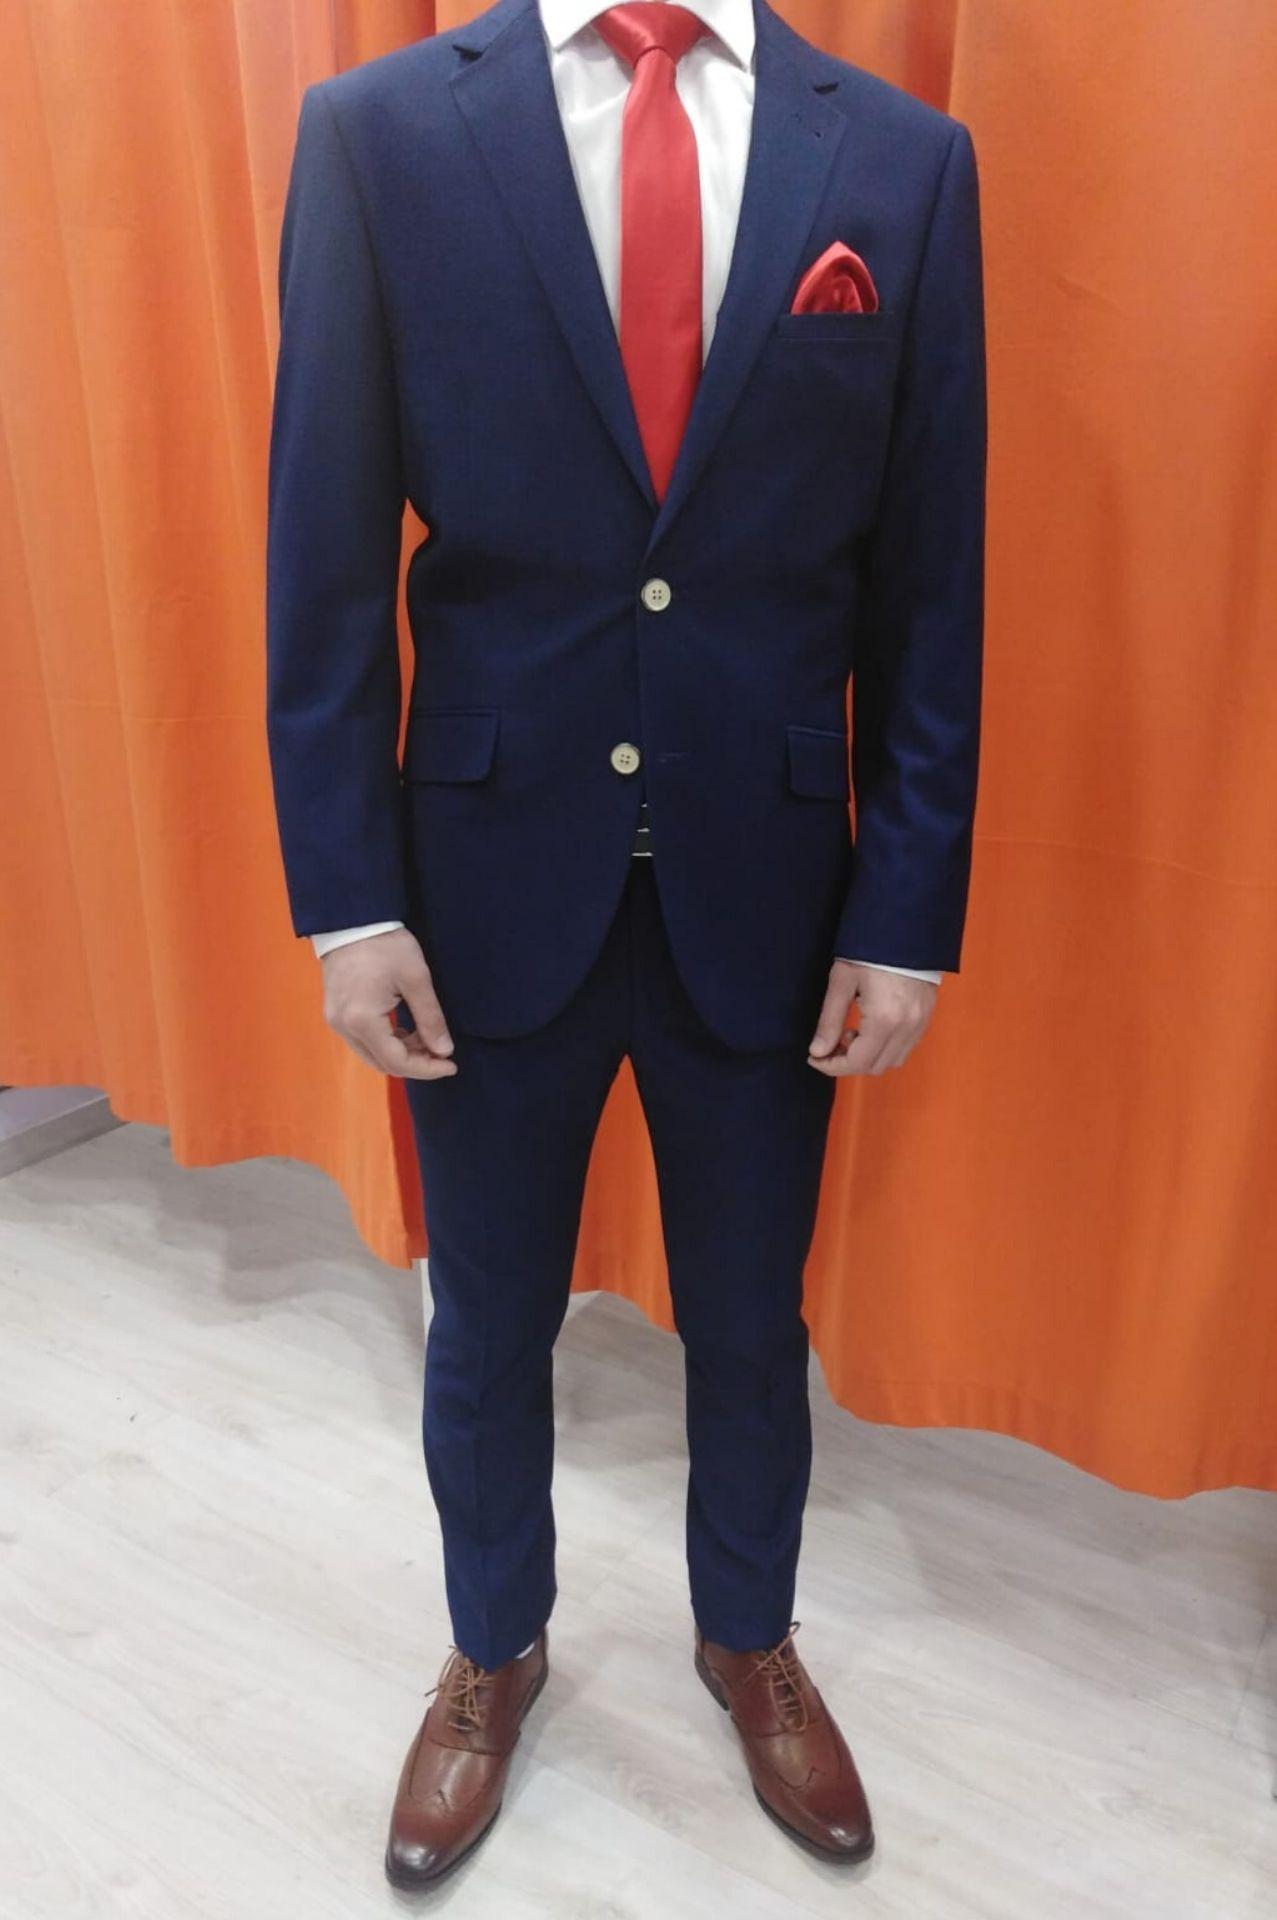 traje-con-dibujo-azul-trd-01-1